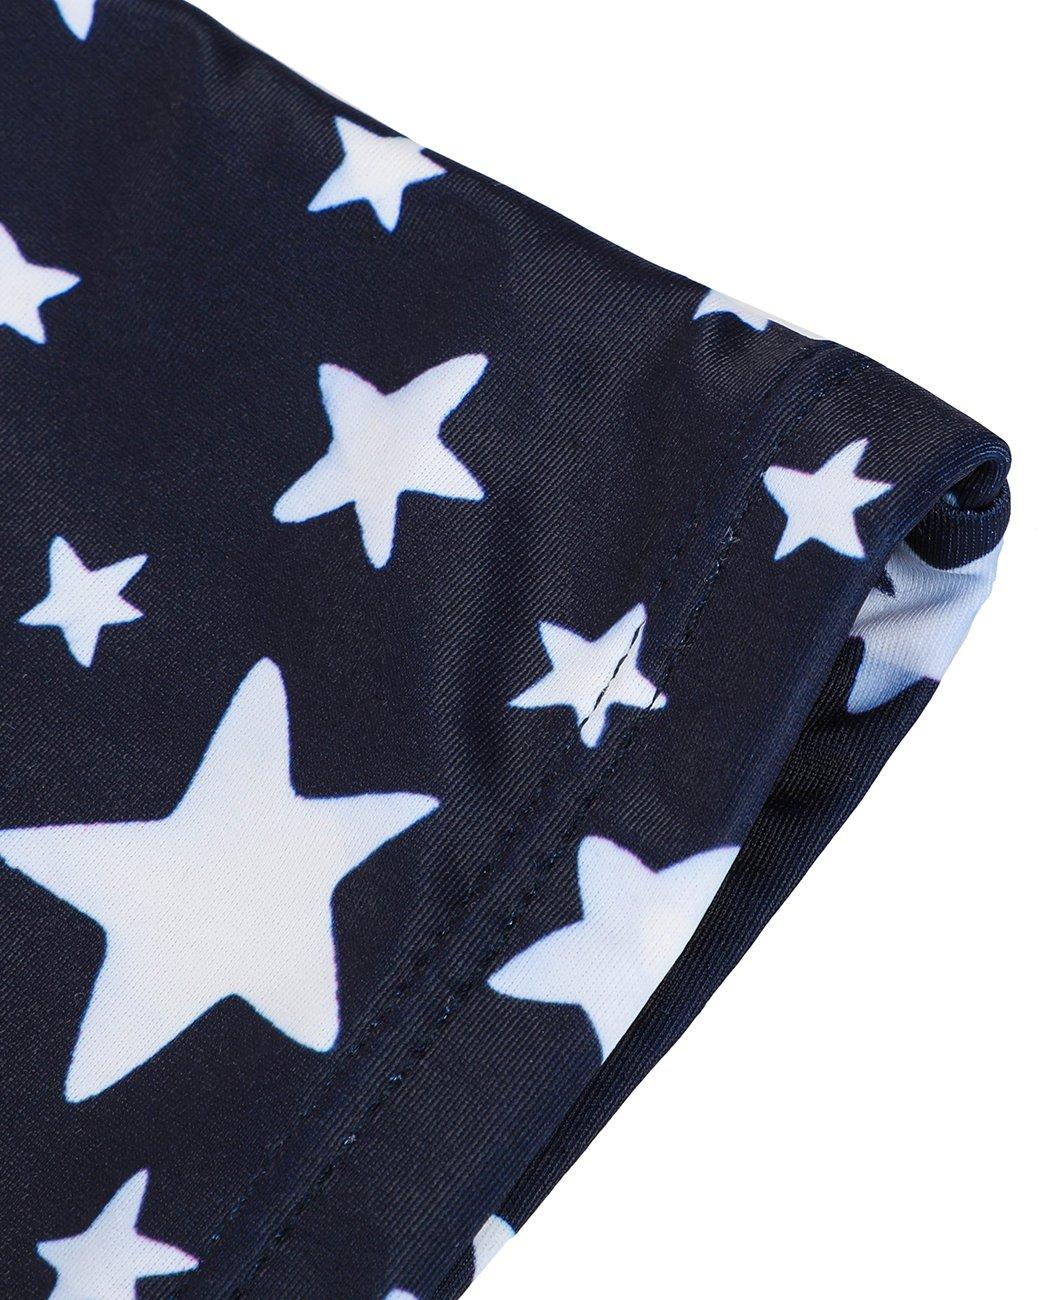 iDrawl Girls Tankini Beach Sport Swimsuit Two Piece Stars Swimwear by iDrawl (Image #5)